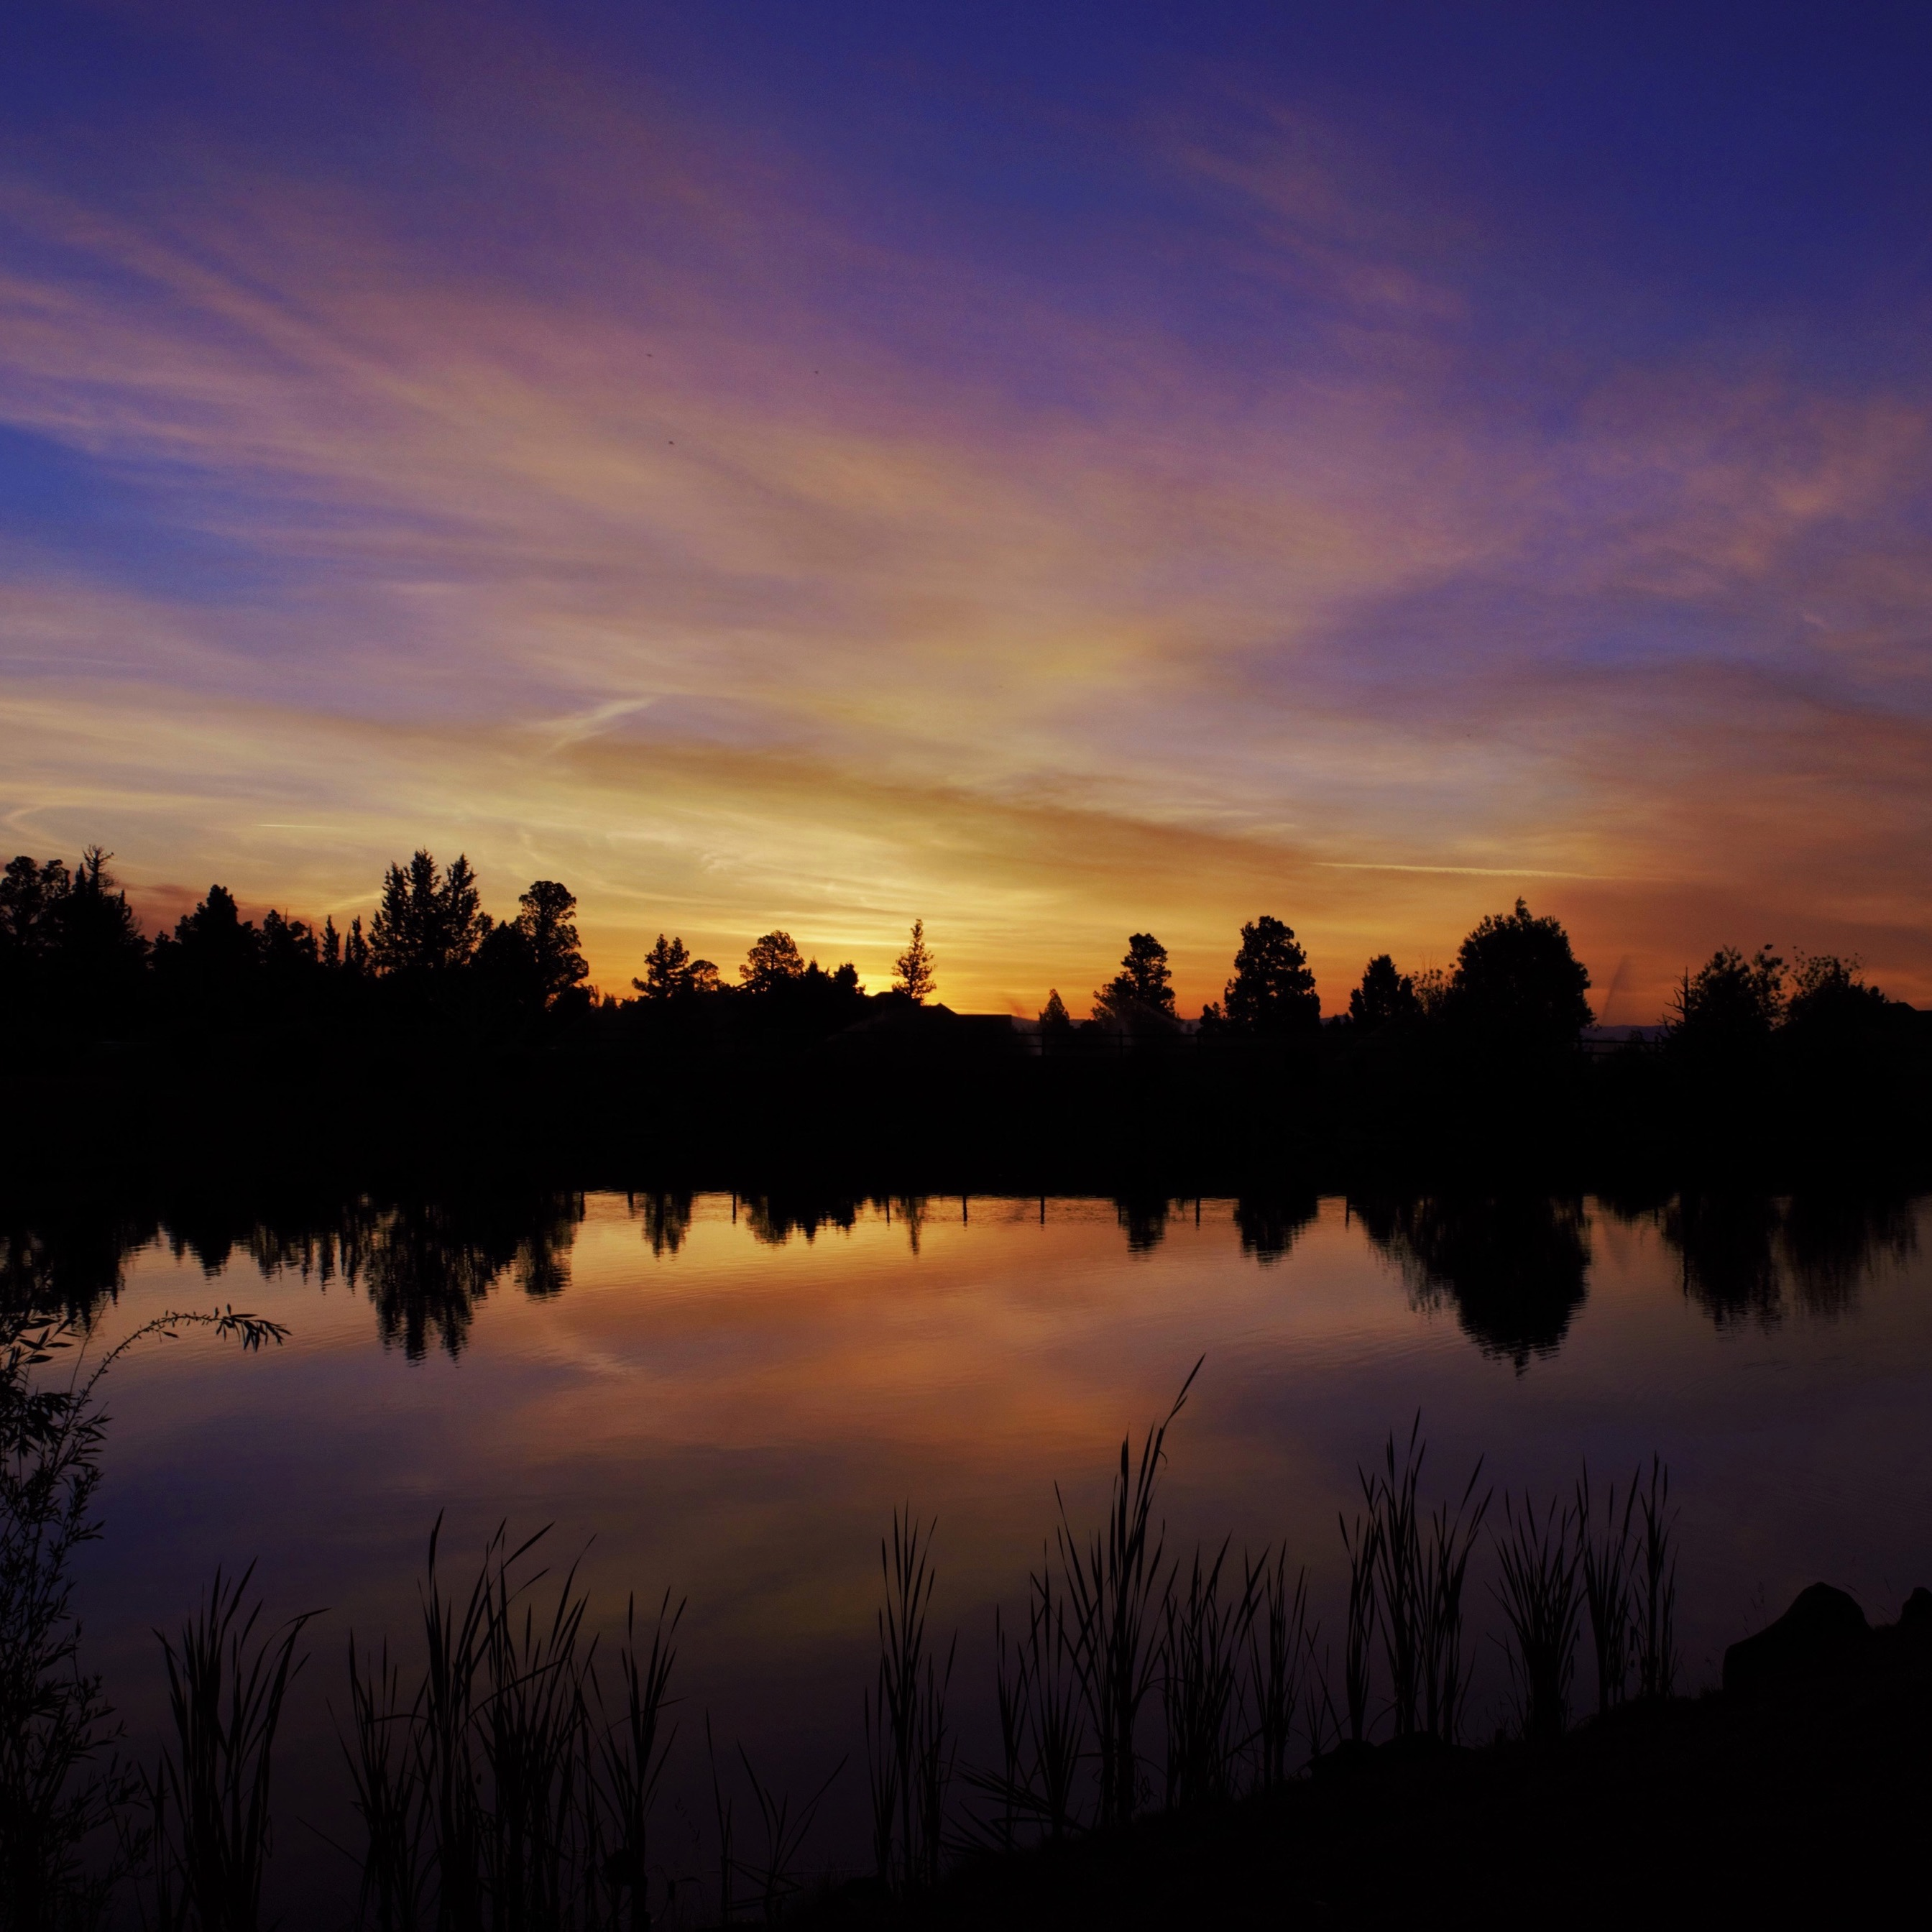 Wallpaper Weekends: The Golden Hour - Sunset iPhone Wallpapers